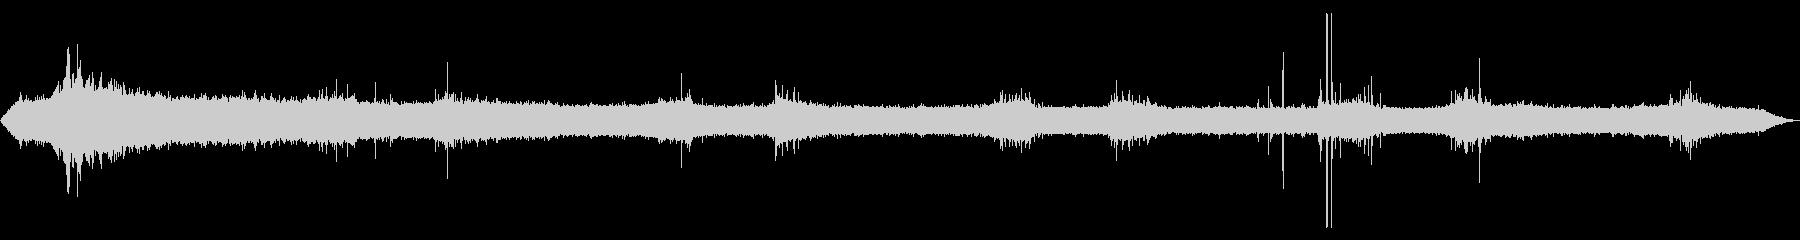 [ASMR]昆虫などが鳴いている森_05の未再生の波形